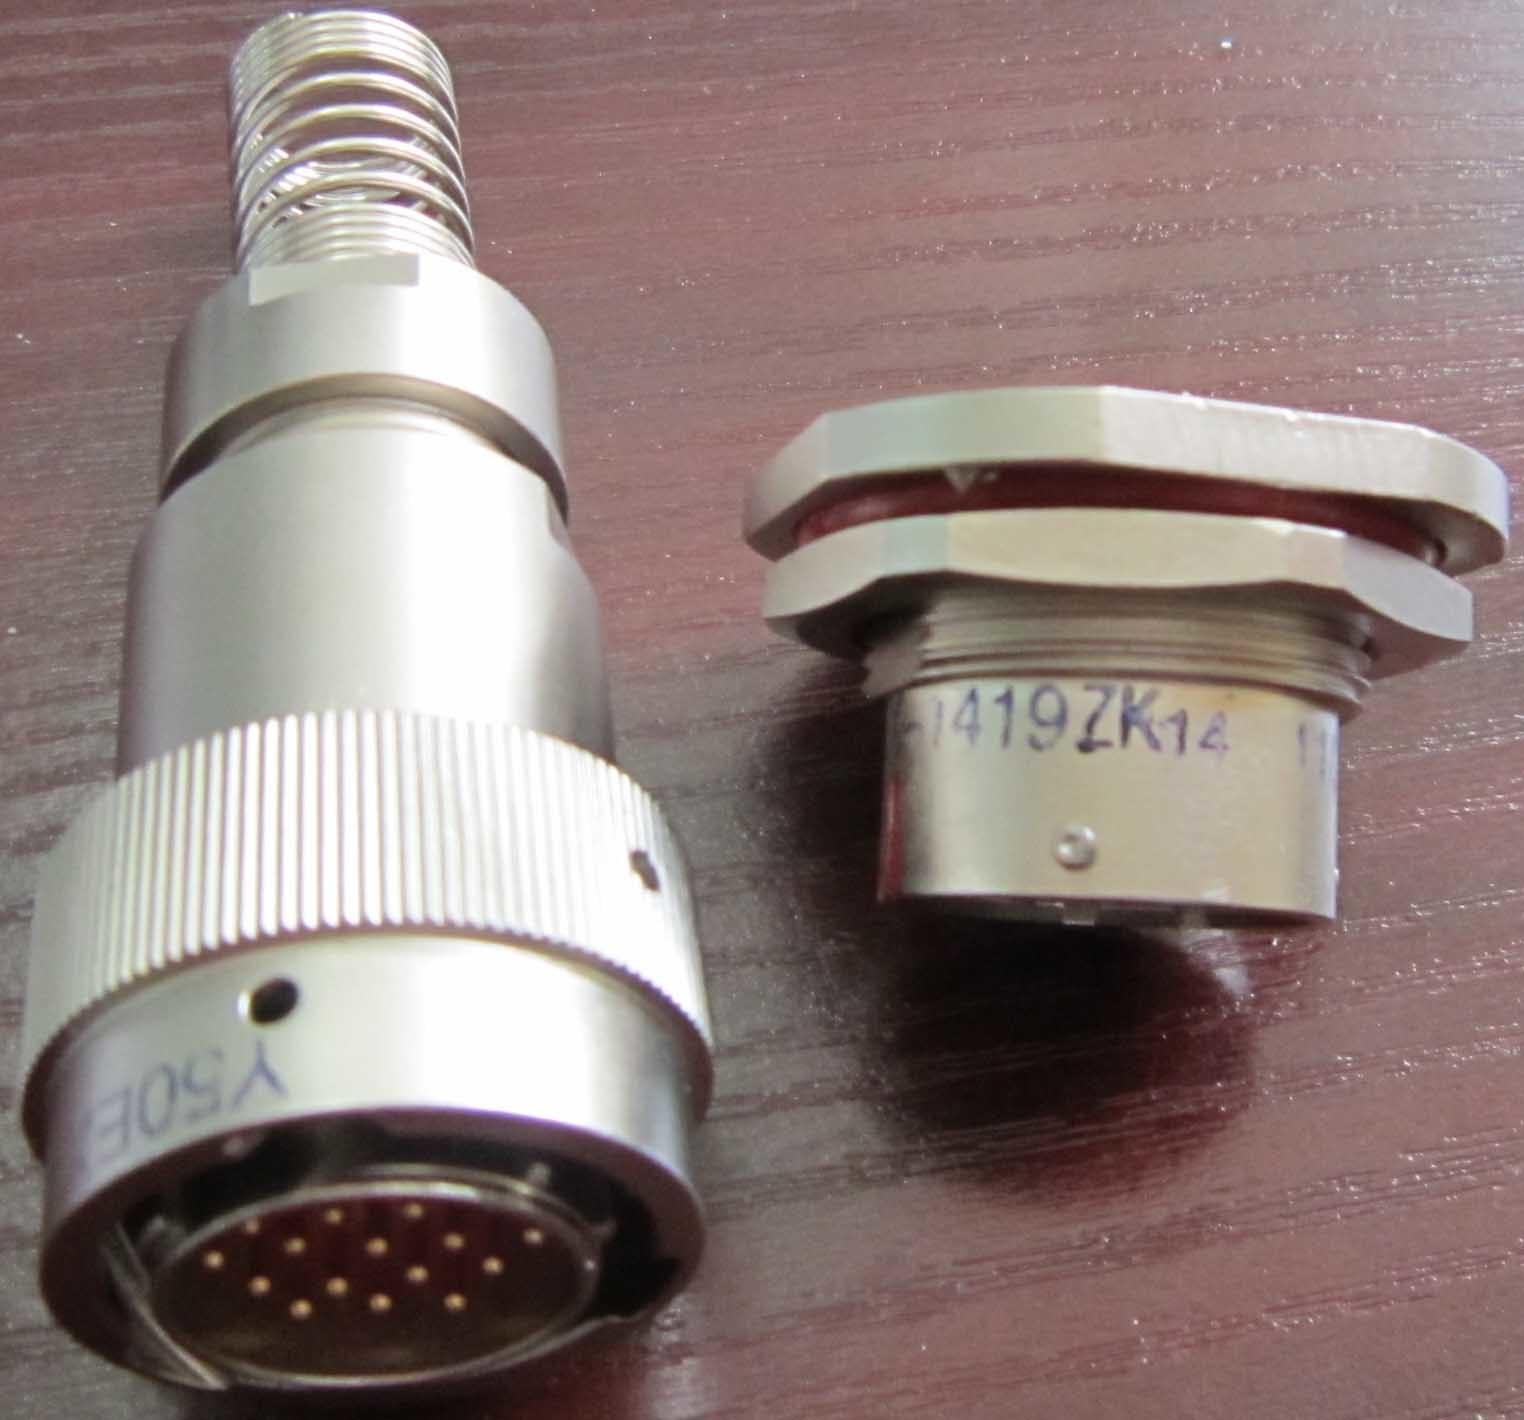 19 Pins Military Connector (Y50EX-1419)